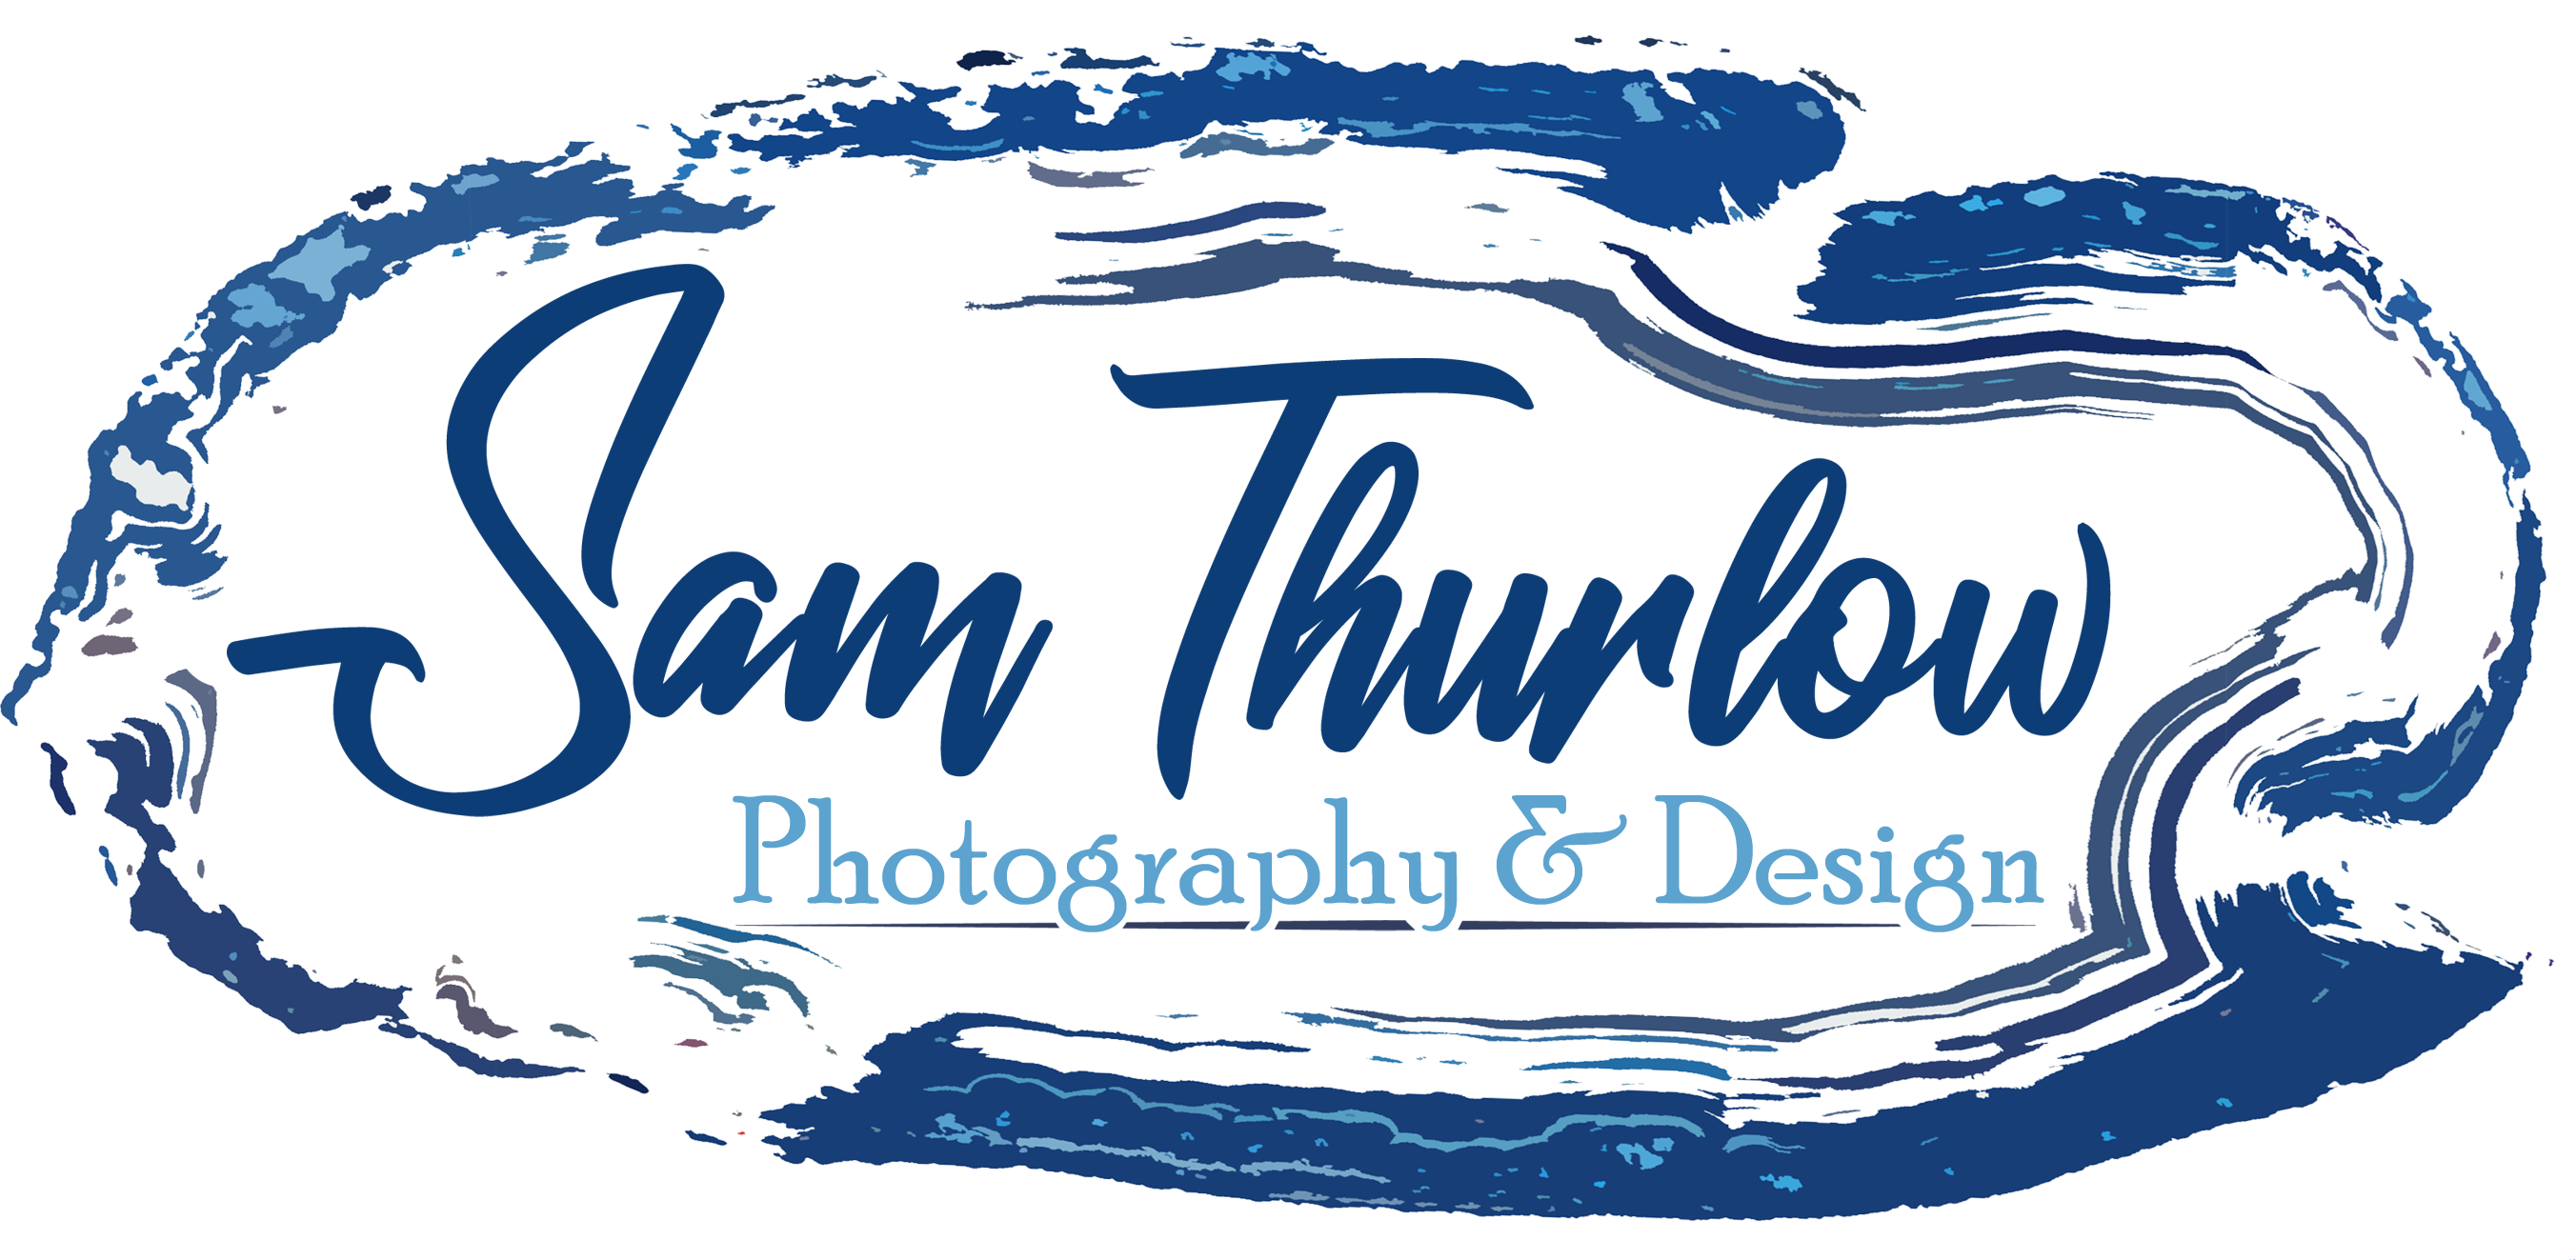 Sam Thurlow